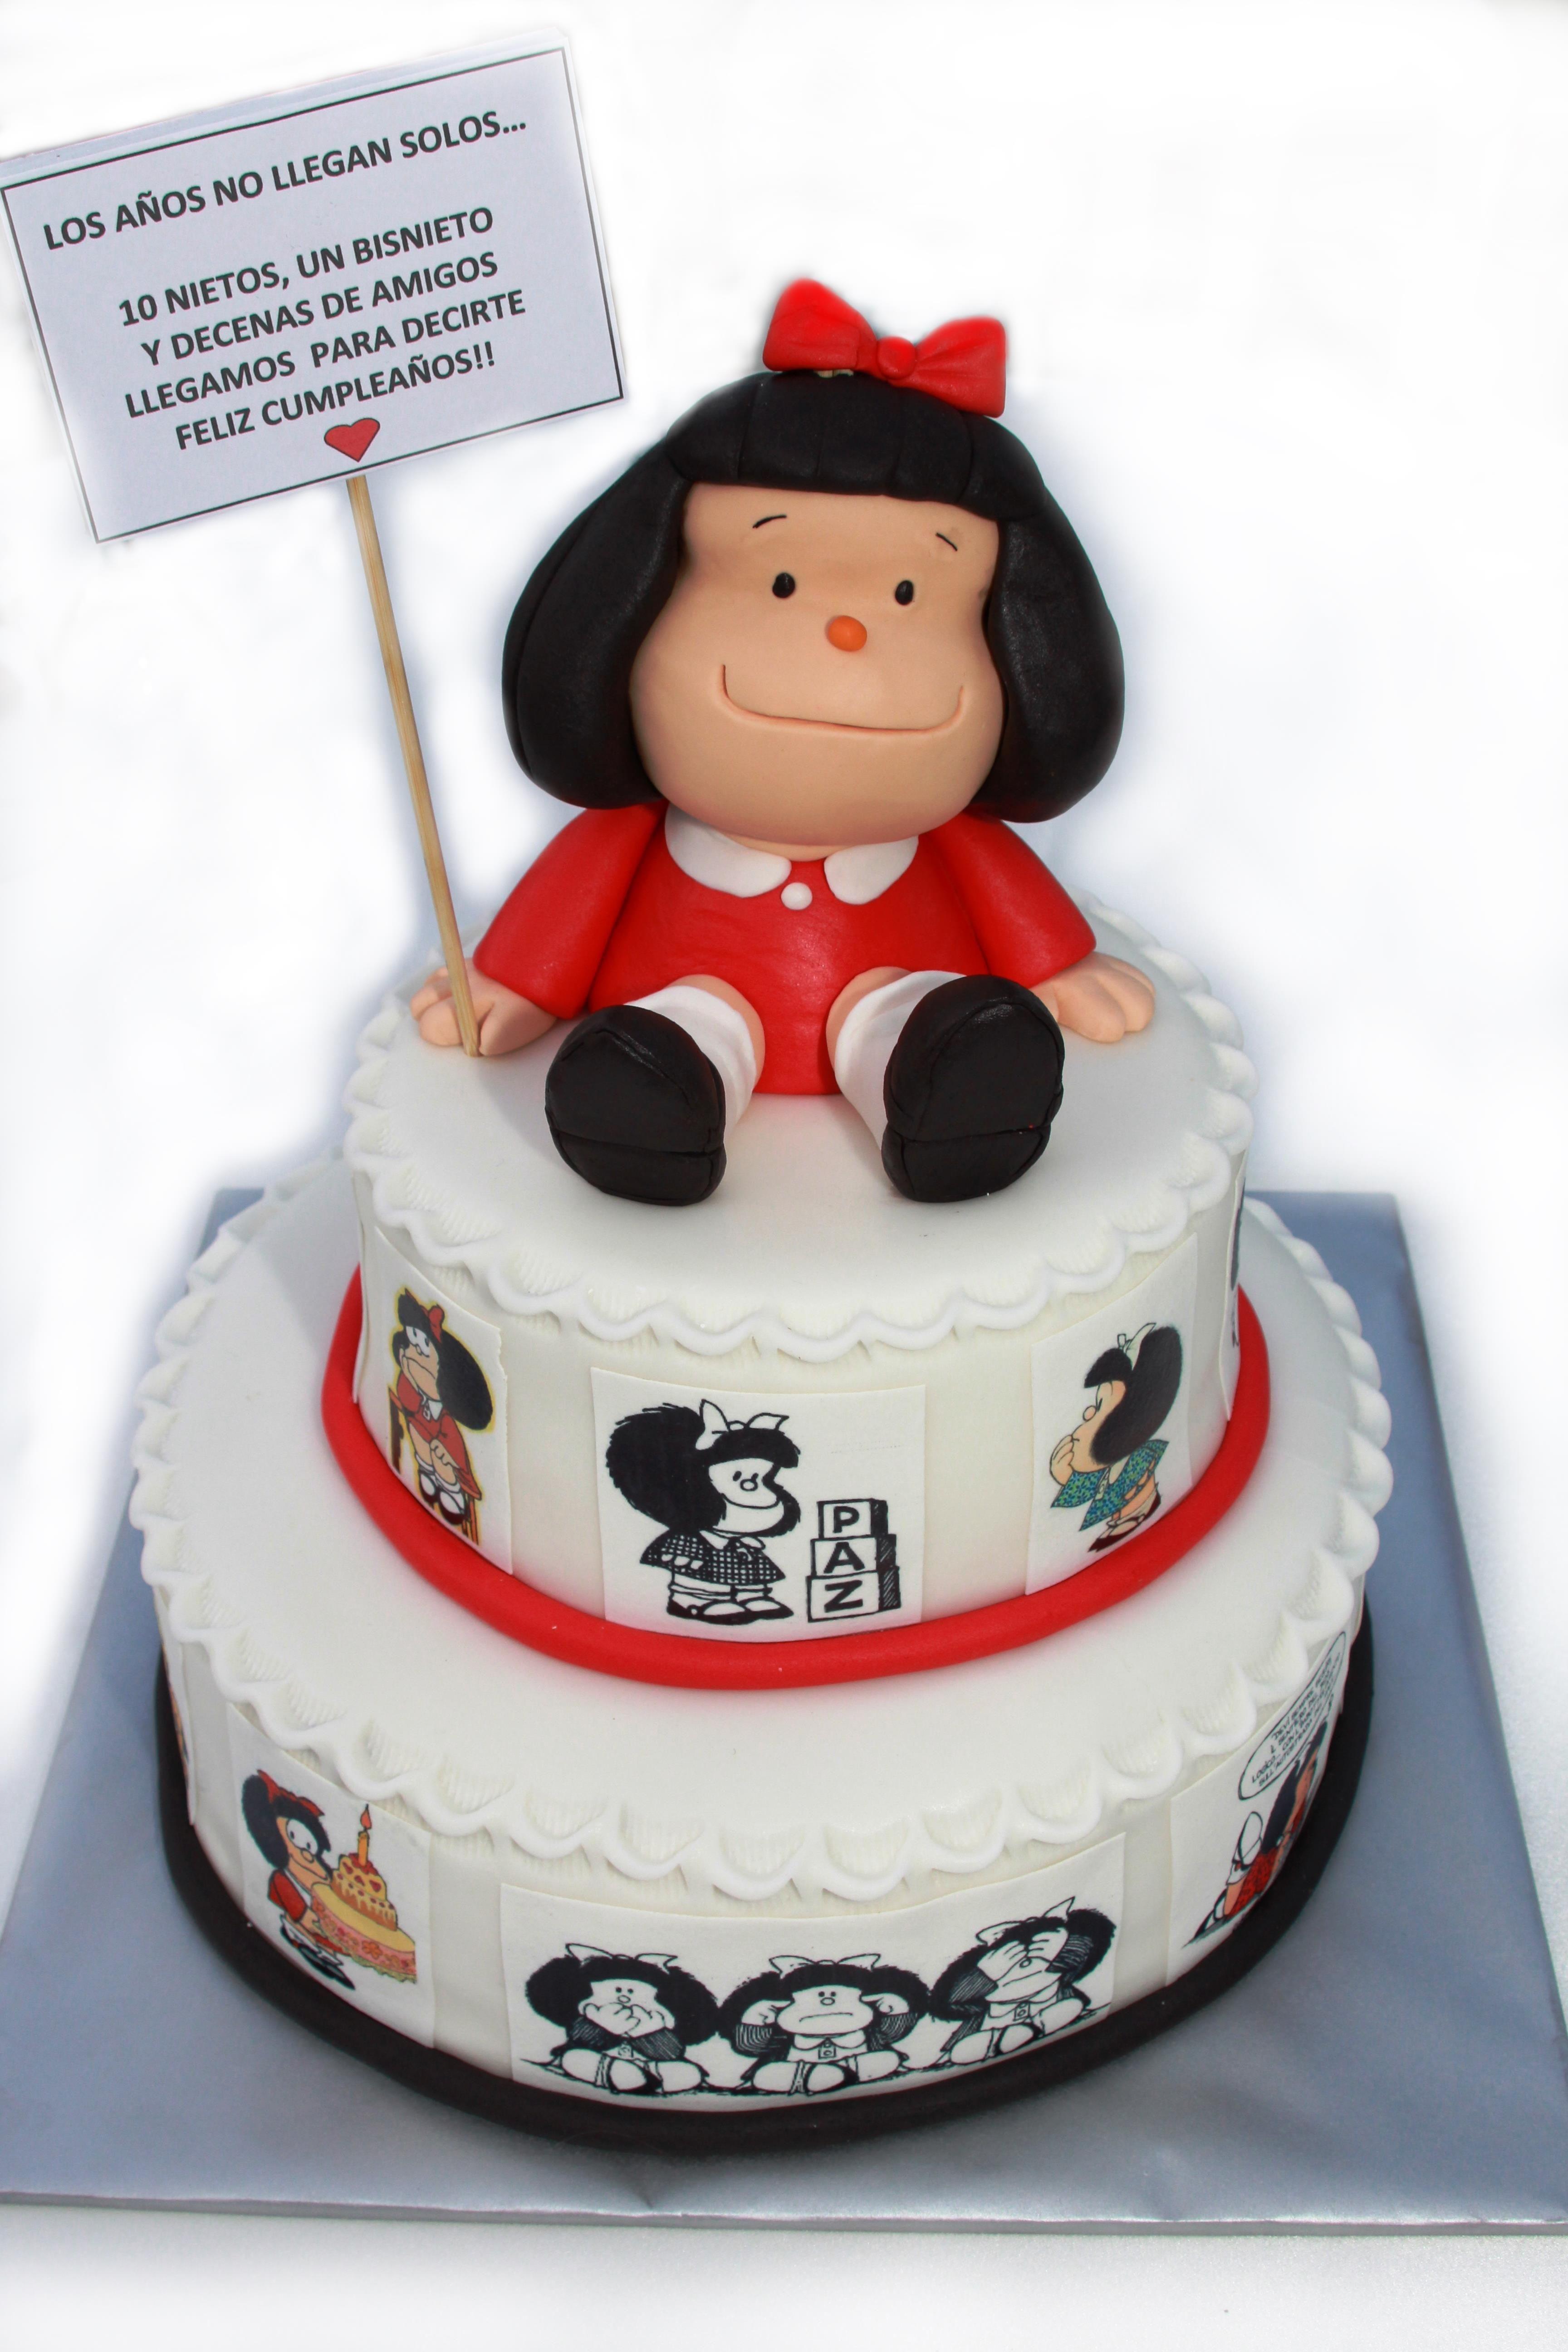 Mafalda cake for my father 80th birthday my cakes Pinterest